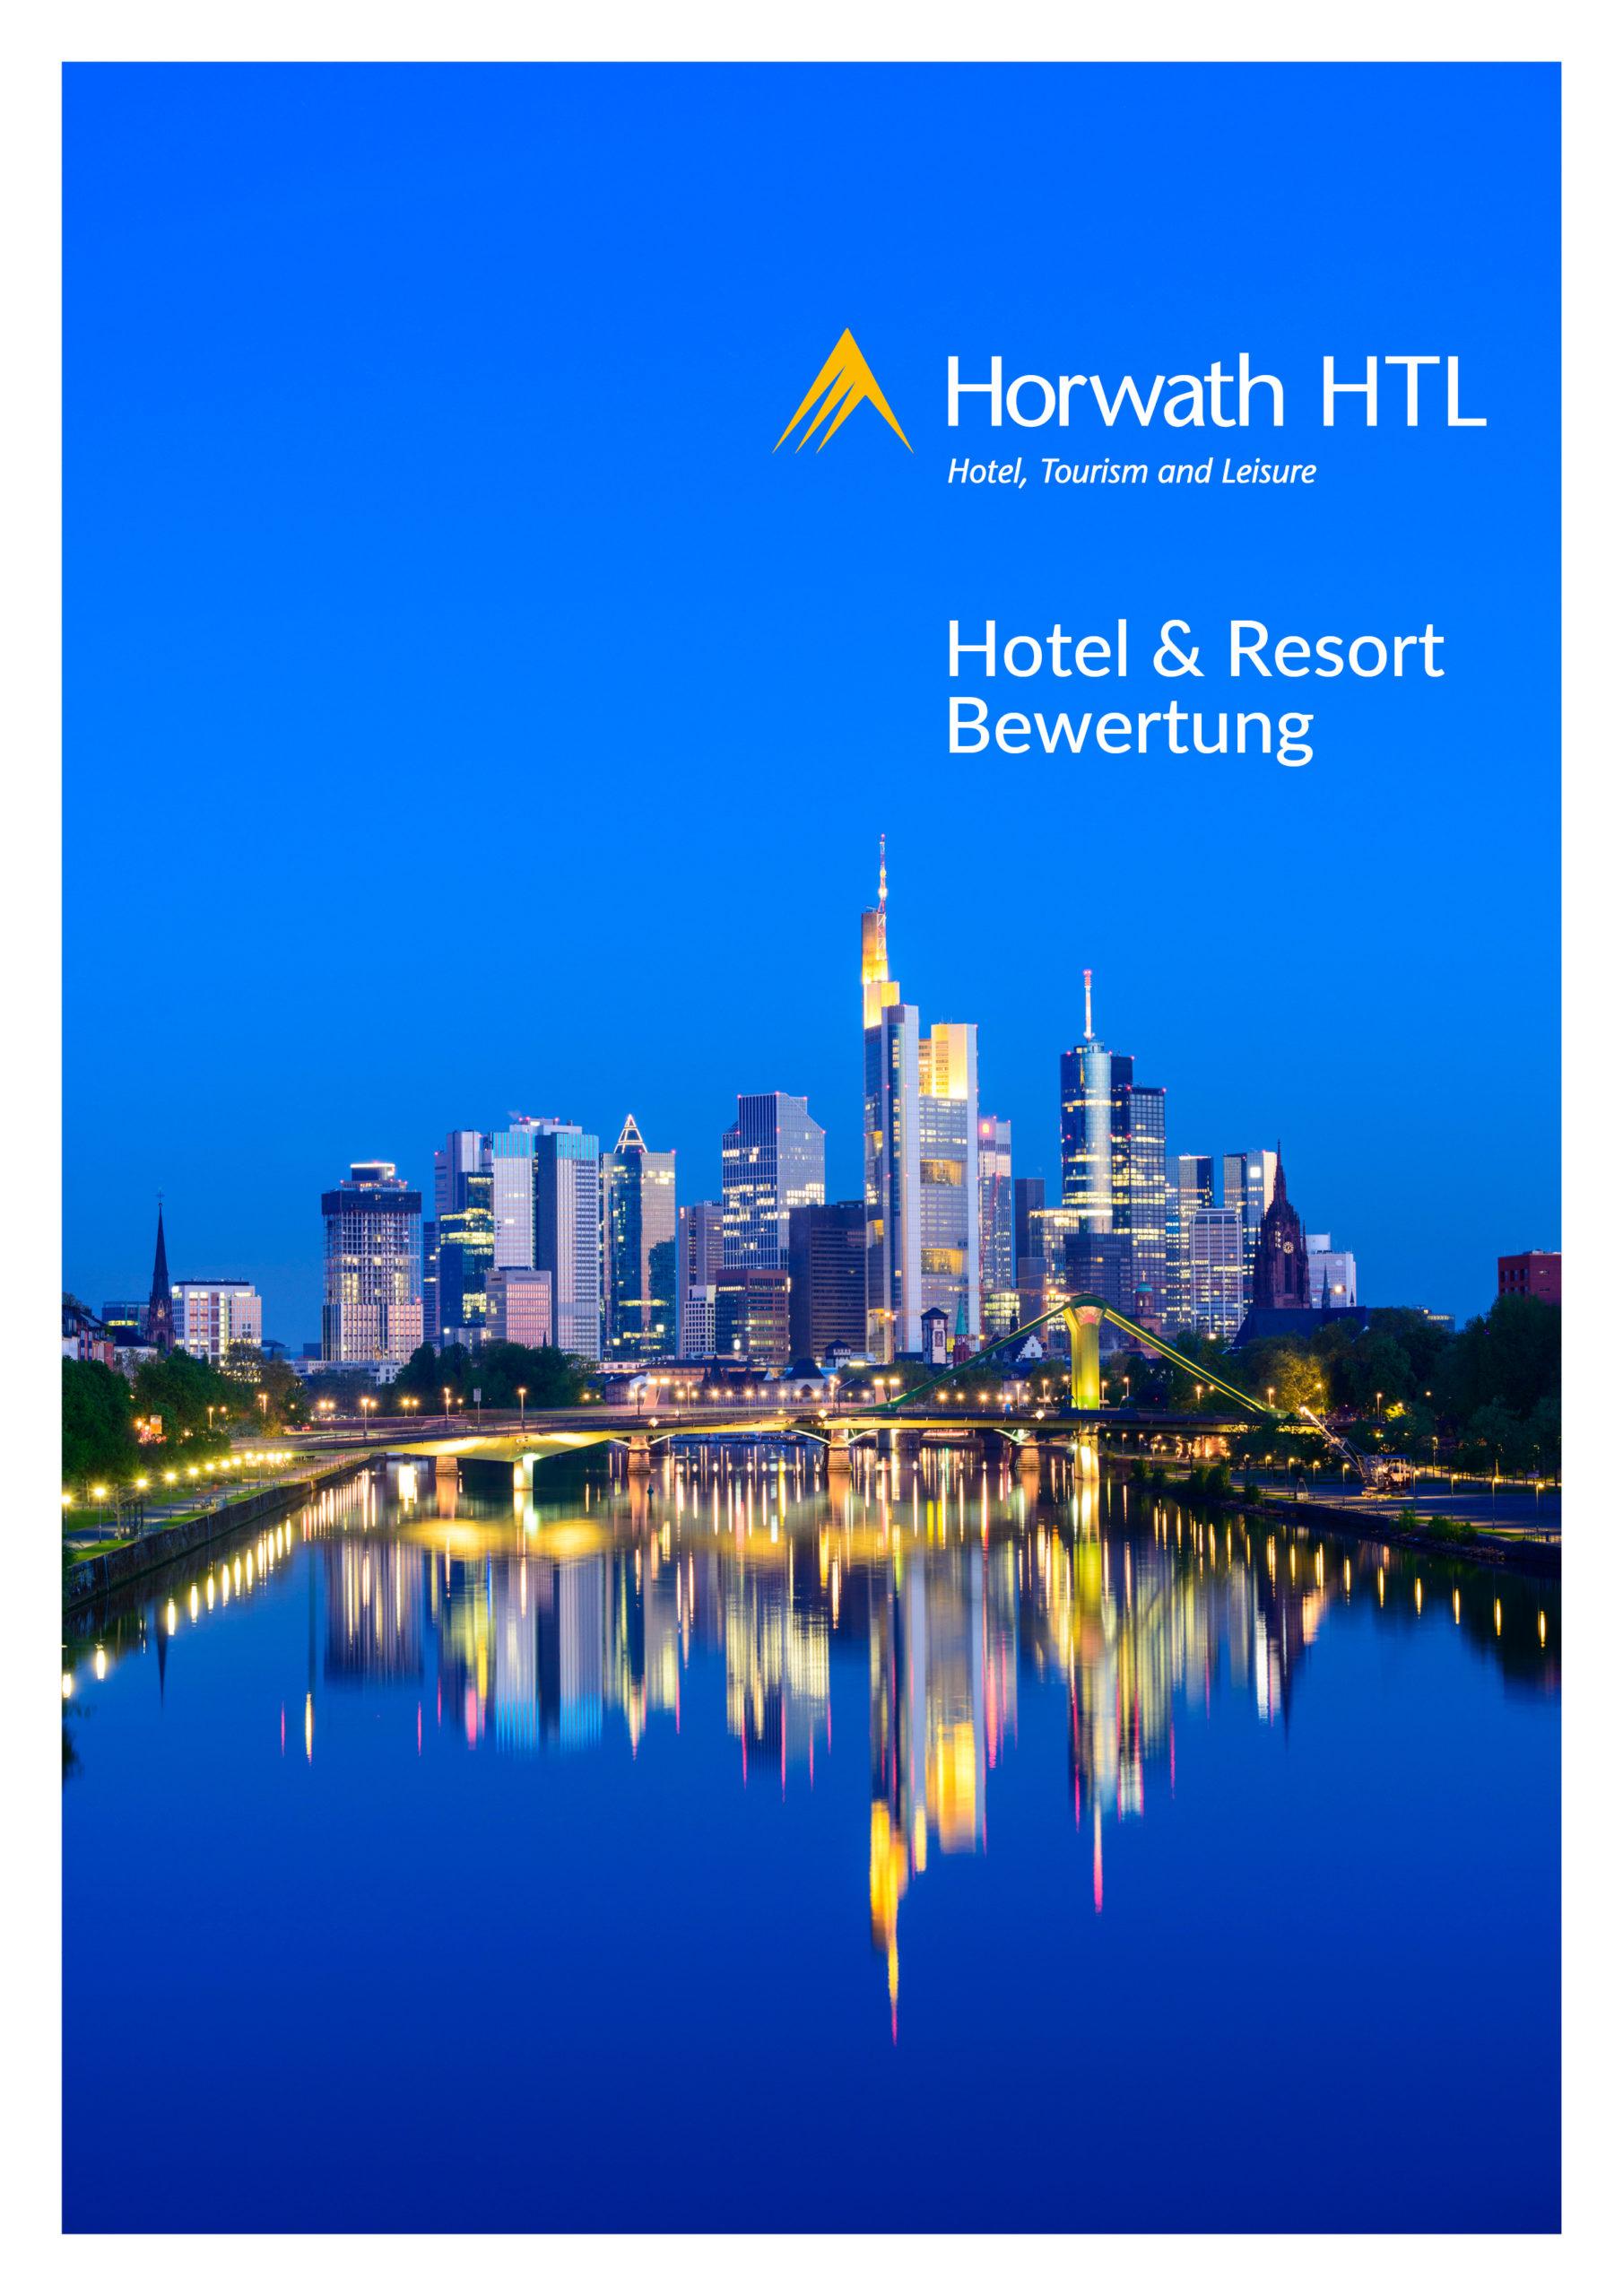 Hotel & Resort Bewertung